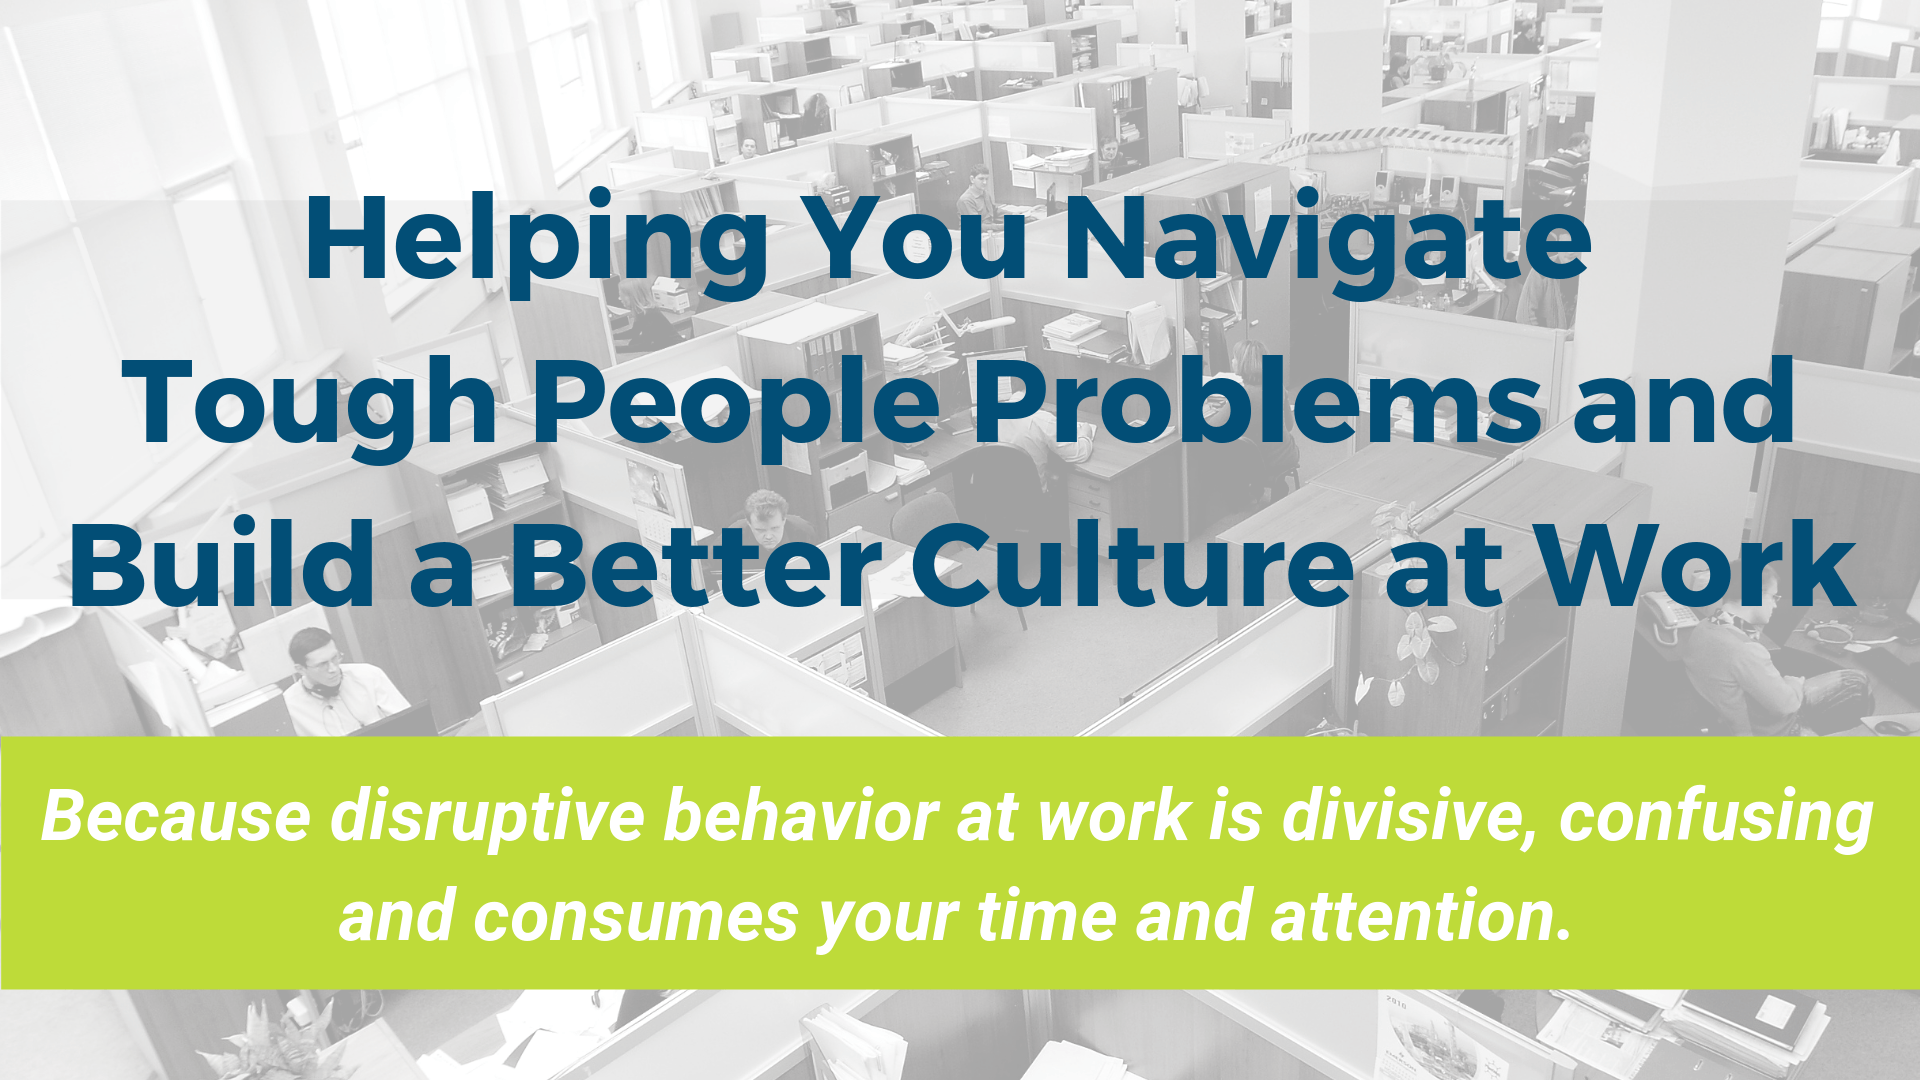 Build a Better Culture